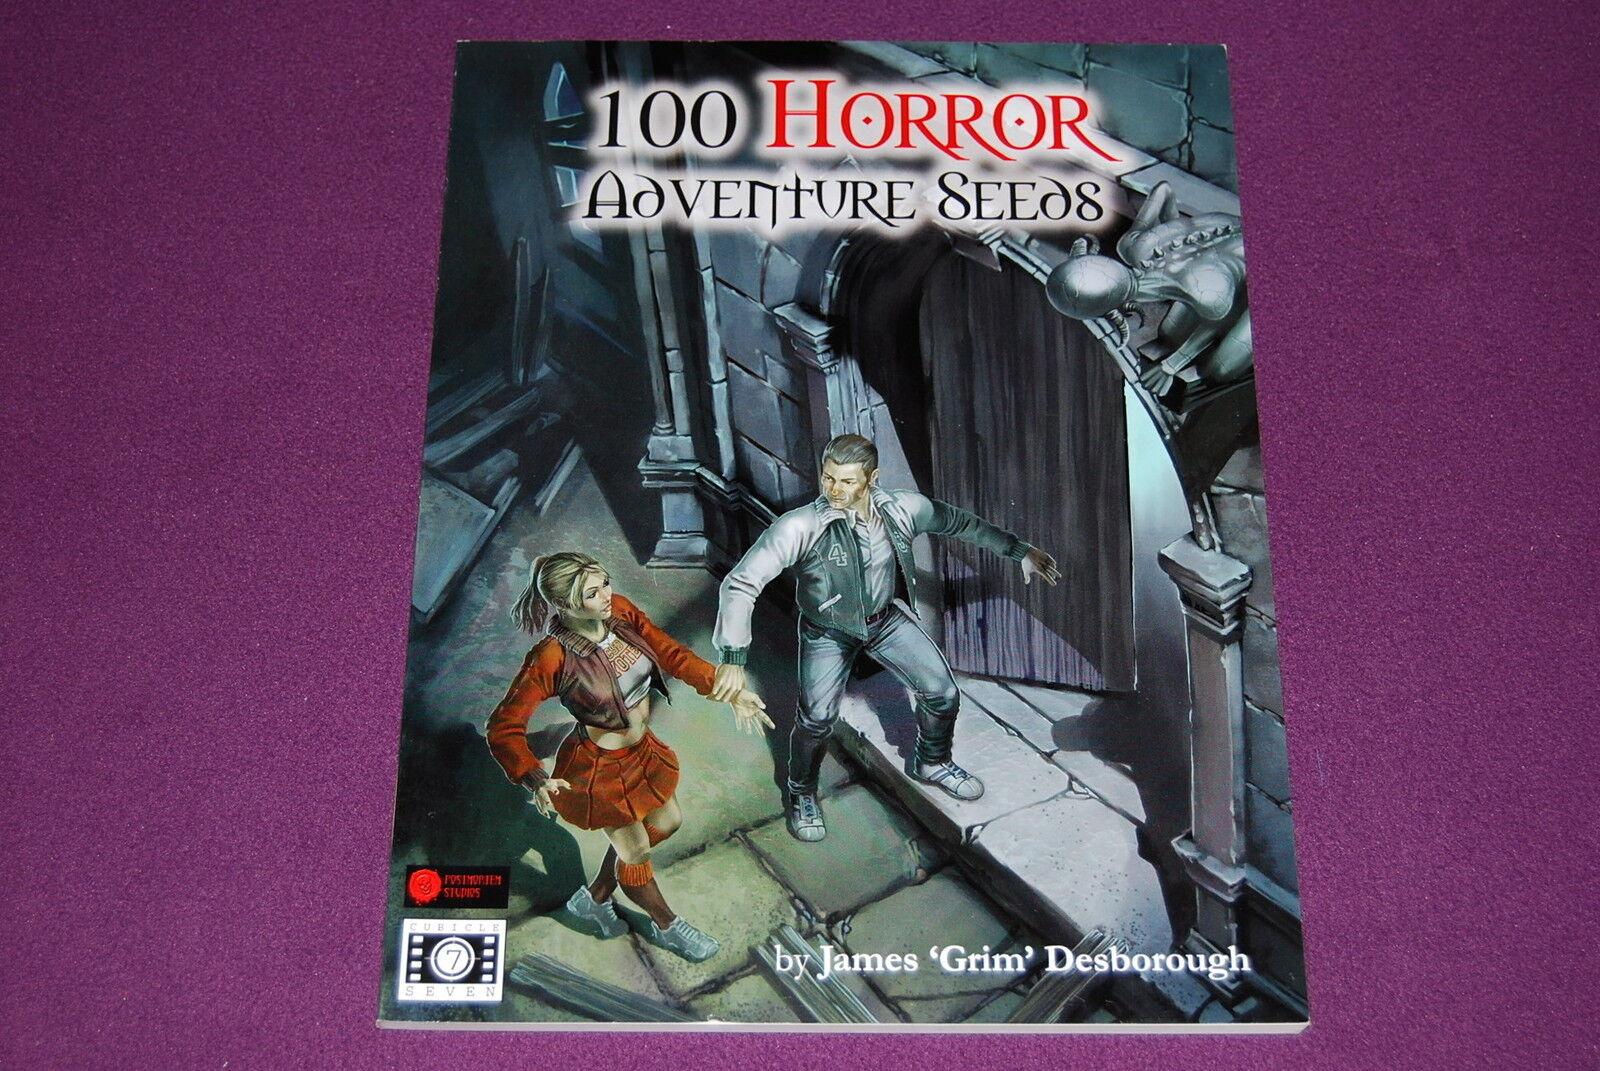 tiempo libre 100 HORROR ADVENTURE SEEDS RPG RPG RPG JDR Jeu de Role - James 'Grim' Desborough  precios razonables